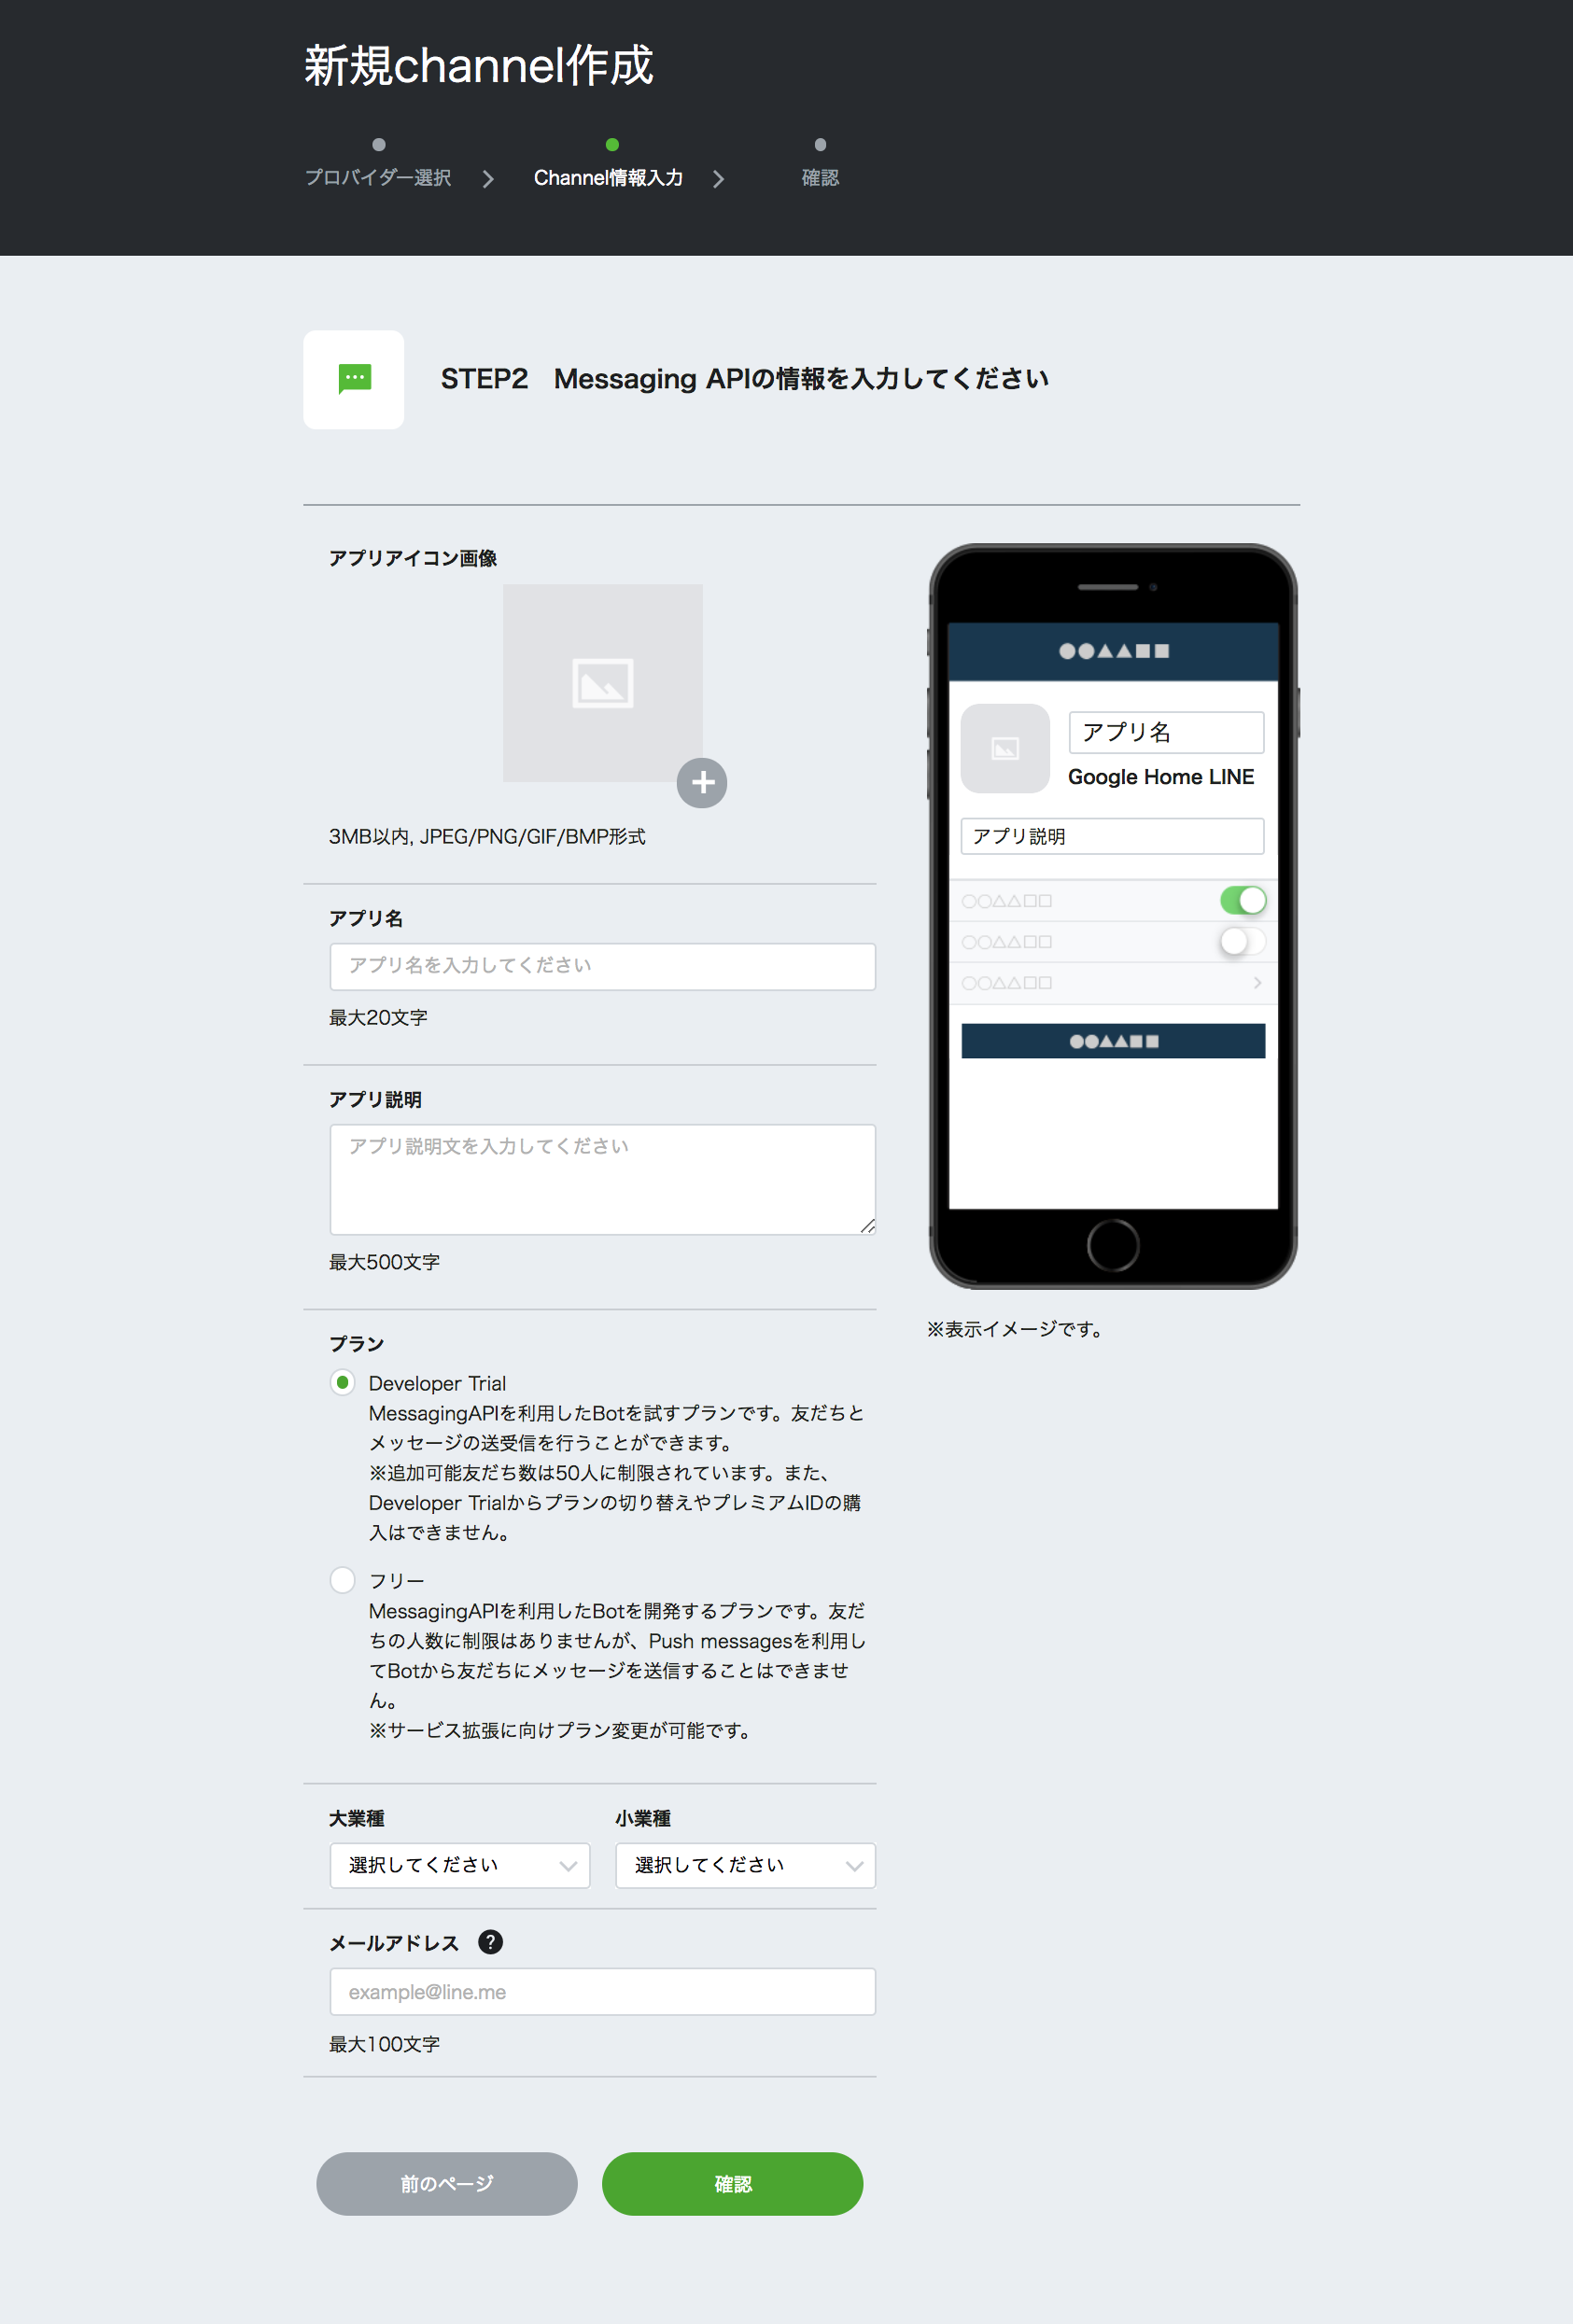 screencapture-developers-line-me-console-register-messaging-api-channel-1510998371989.png